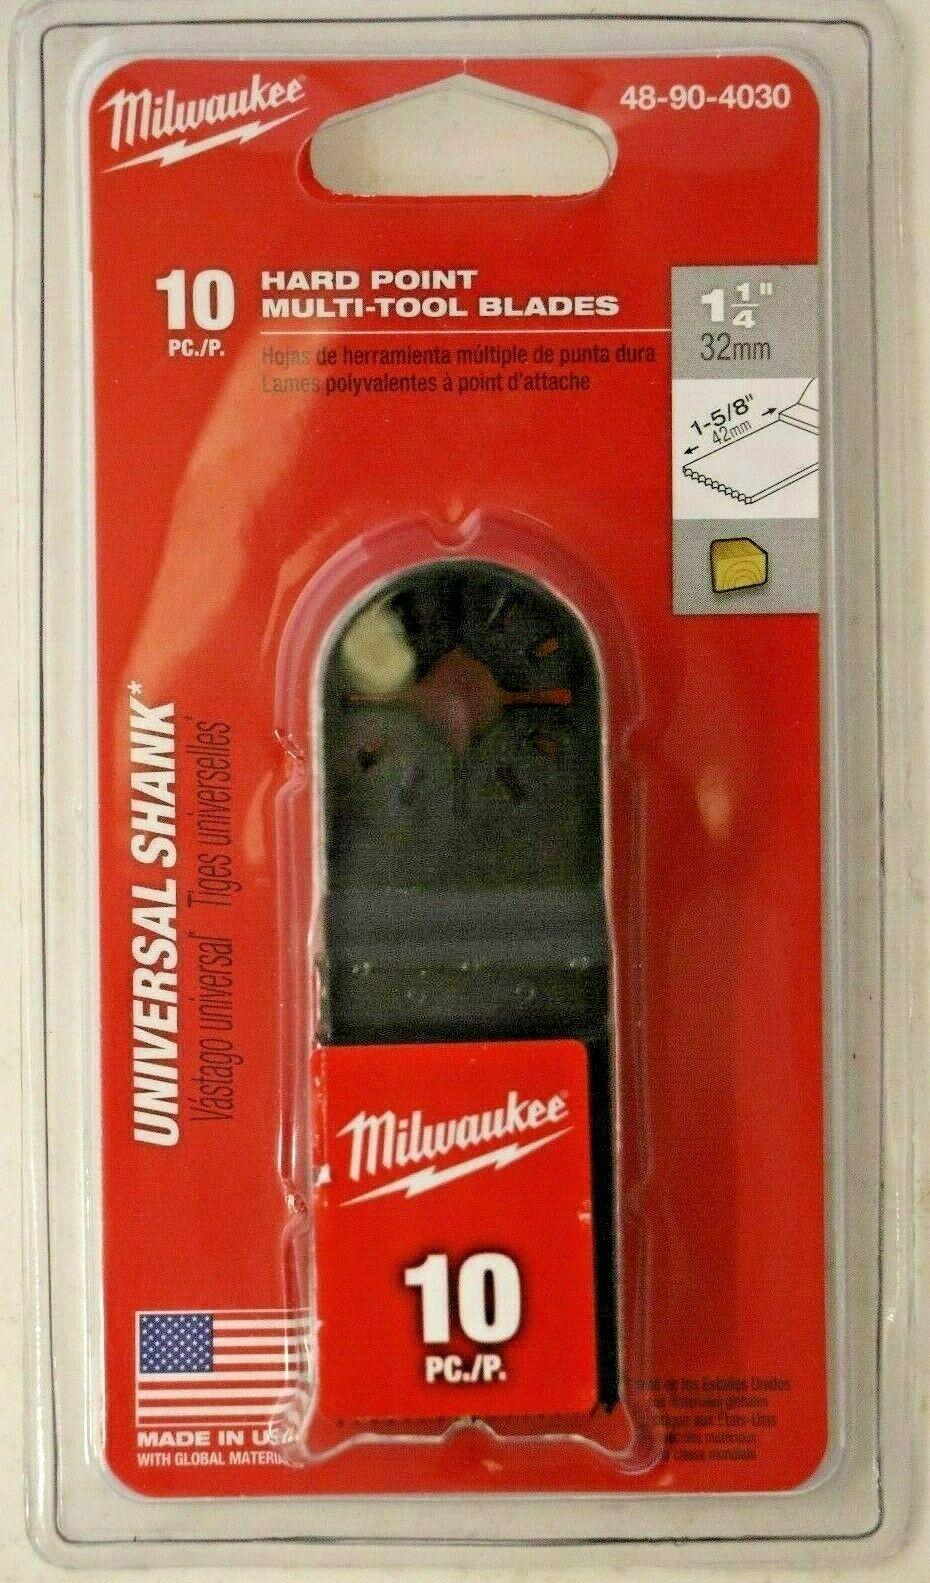 9 tlg Milwaukee Multitool Zubehör-Set Sägeblätter Satz mit Universal-Aufnahme